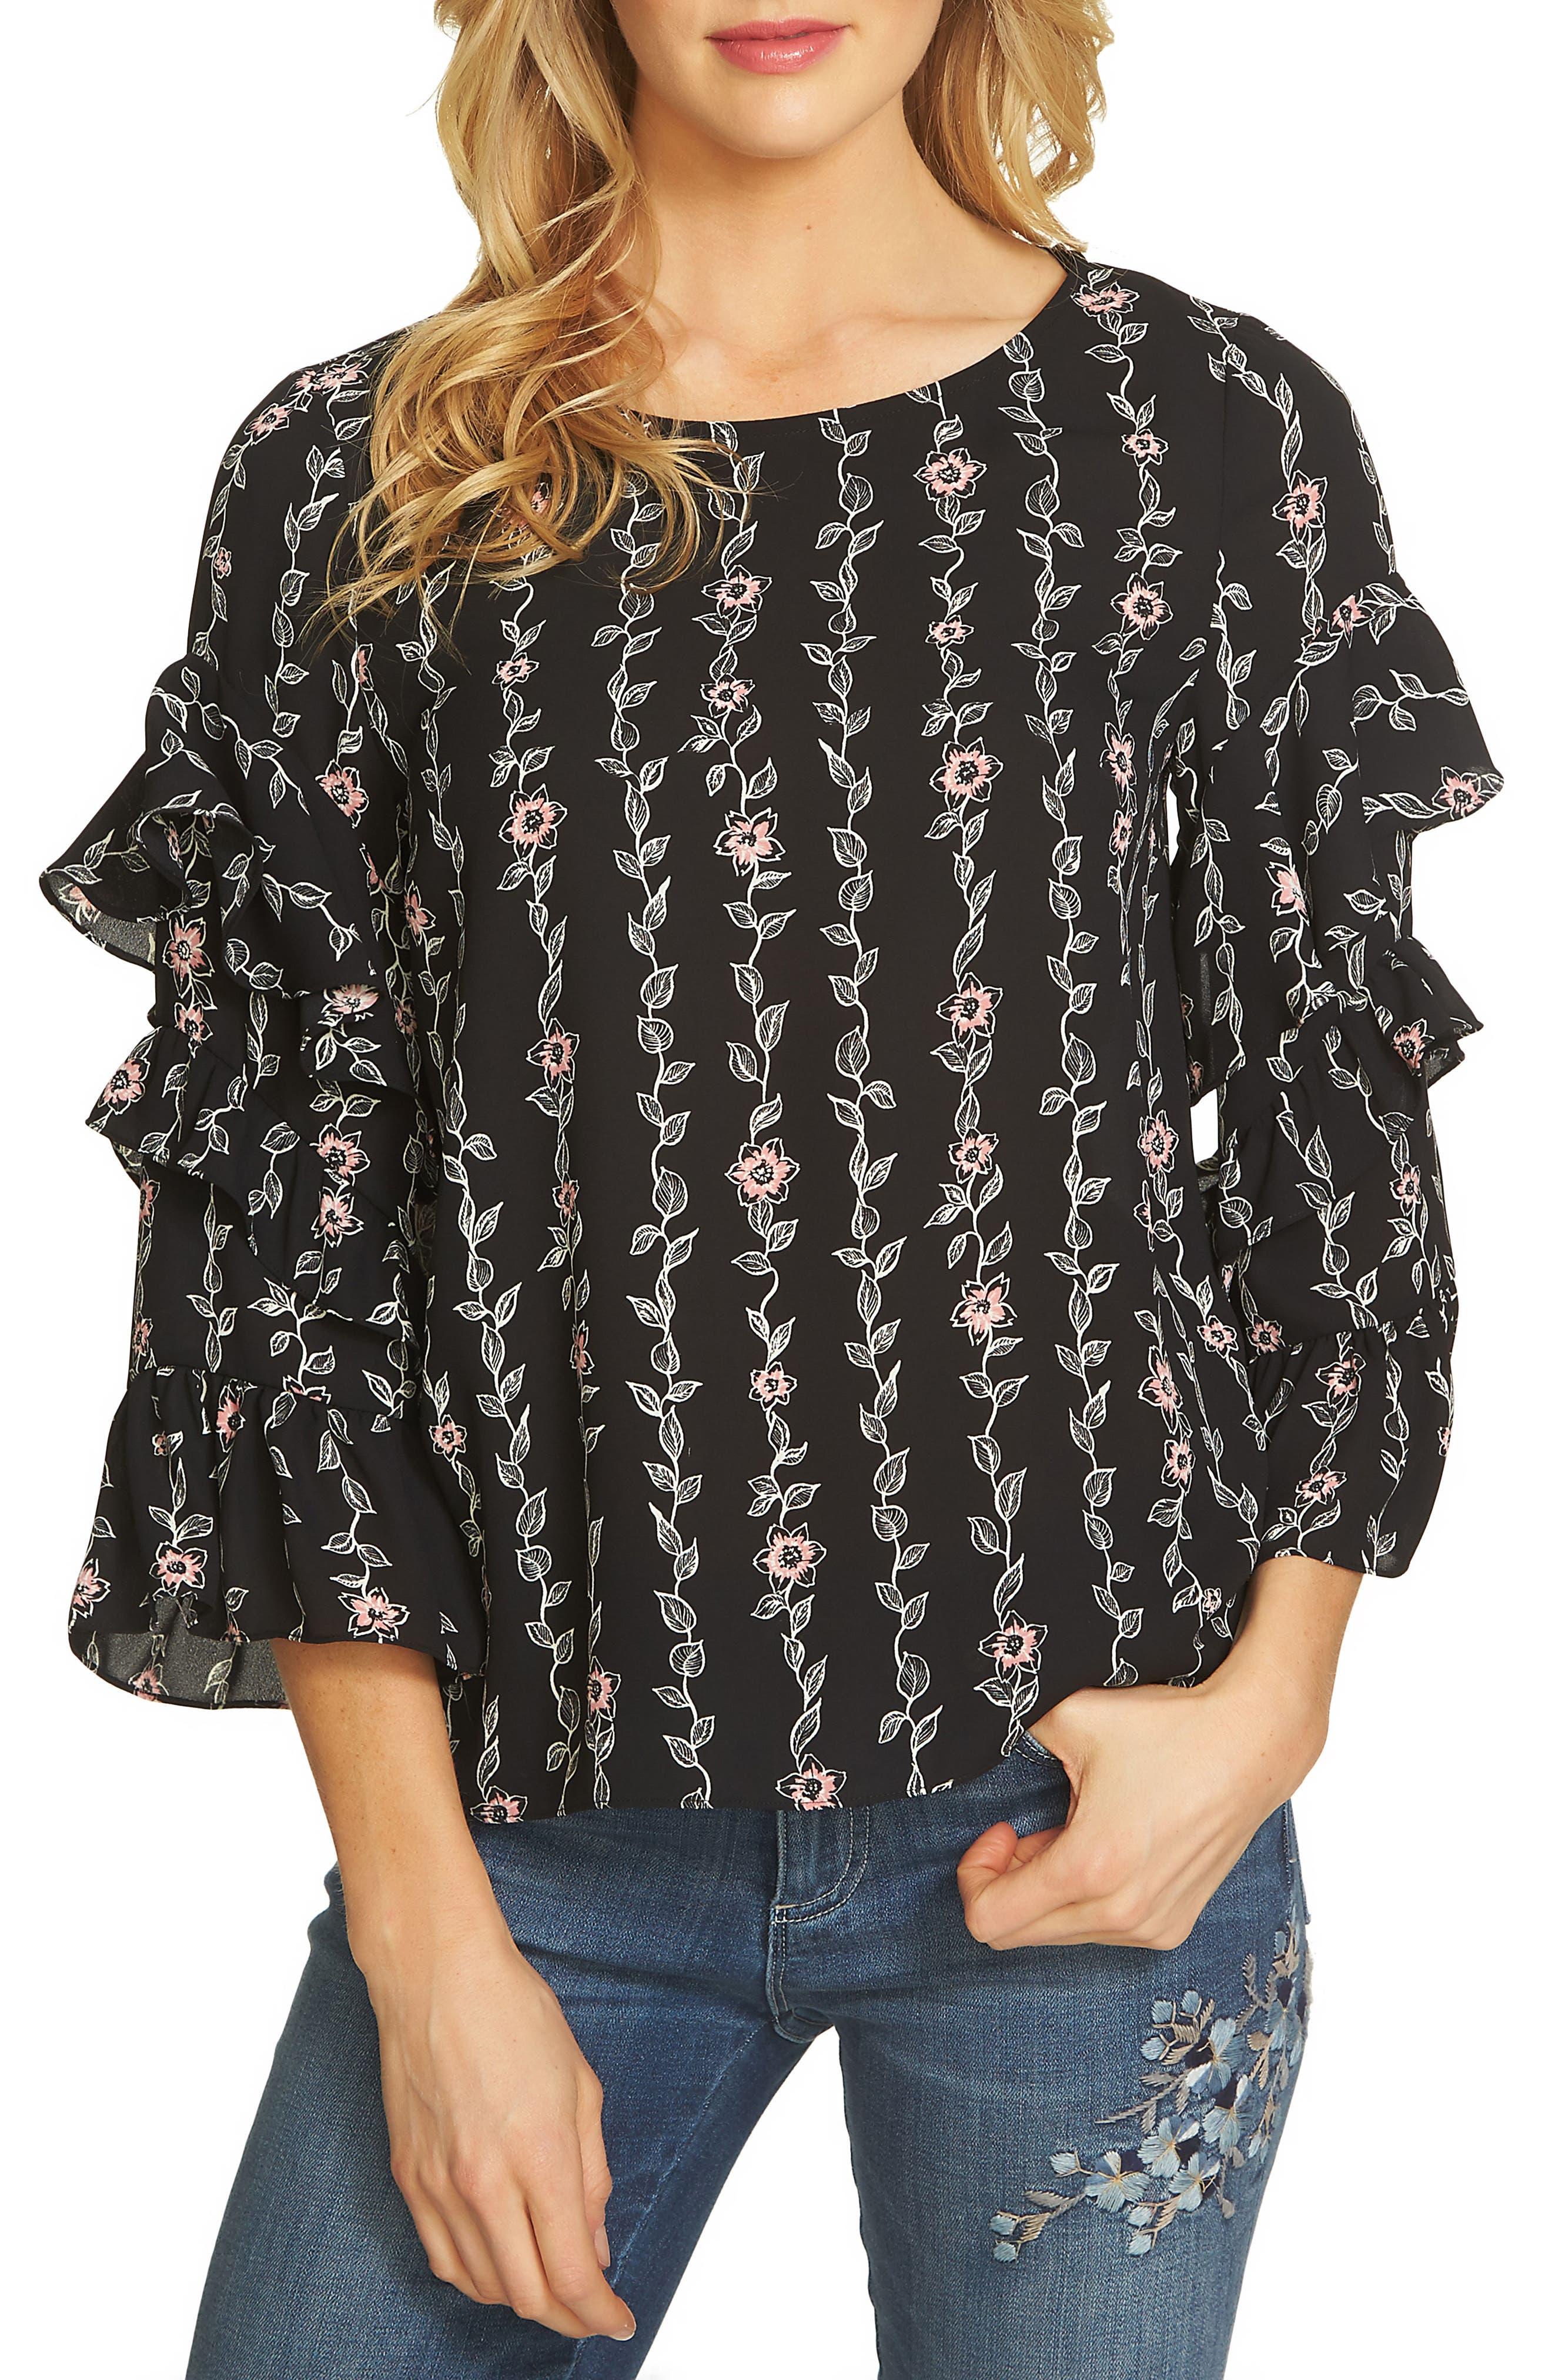 Main Image - Cece Printed Ruffle Sleeve Blouse